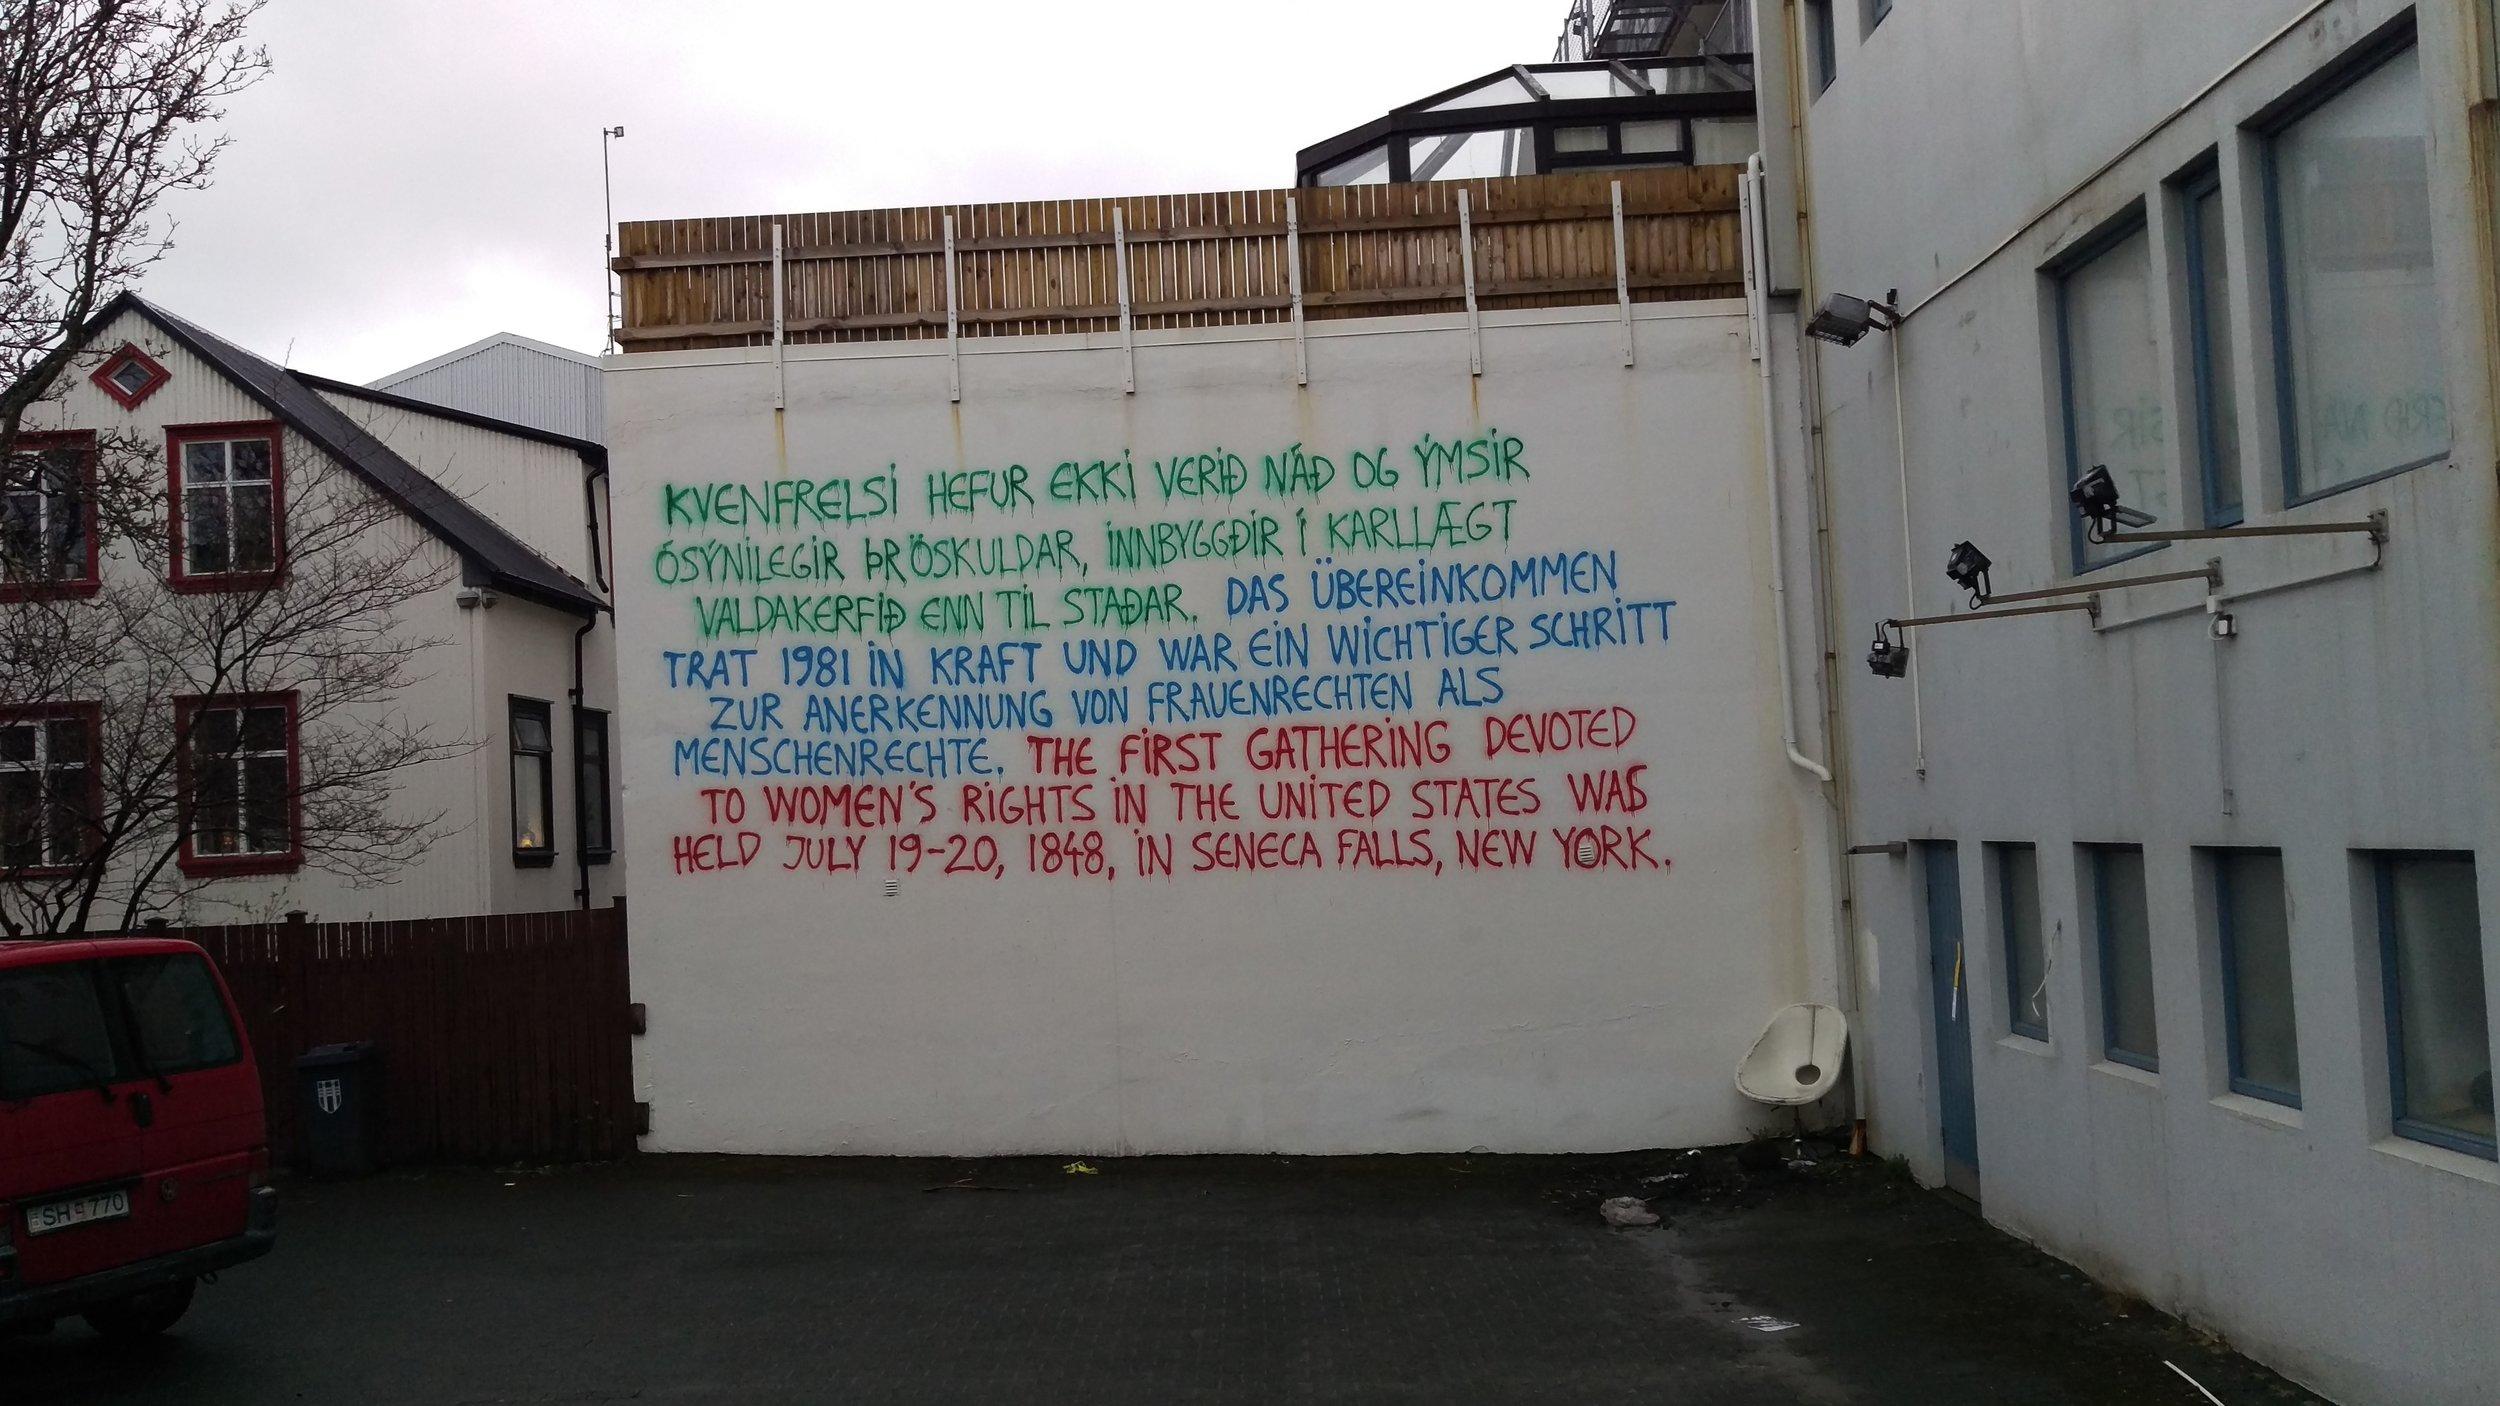 Mural en calle Frakkastigur, Reykjavik, Islandia. 1ro de Mayo, 2017. ©A. Iaroc